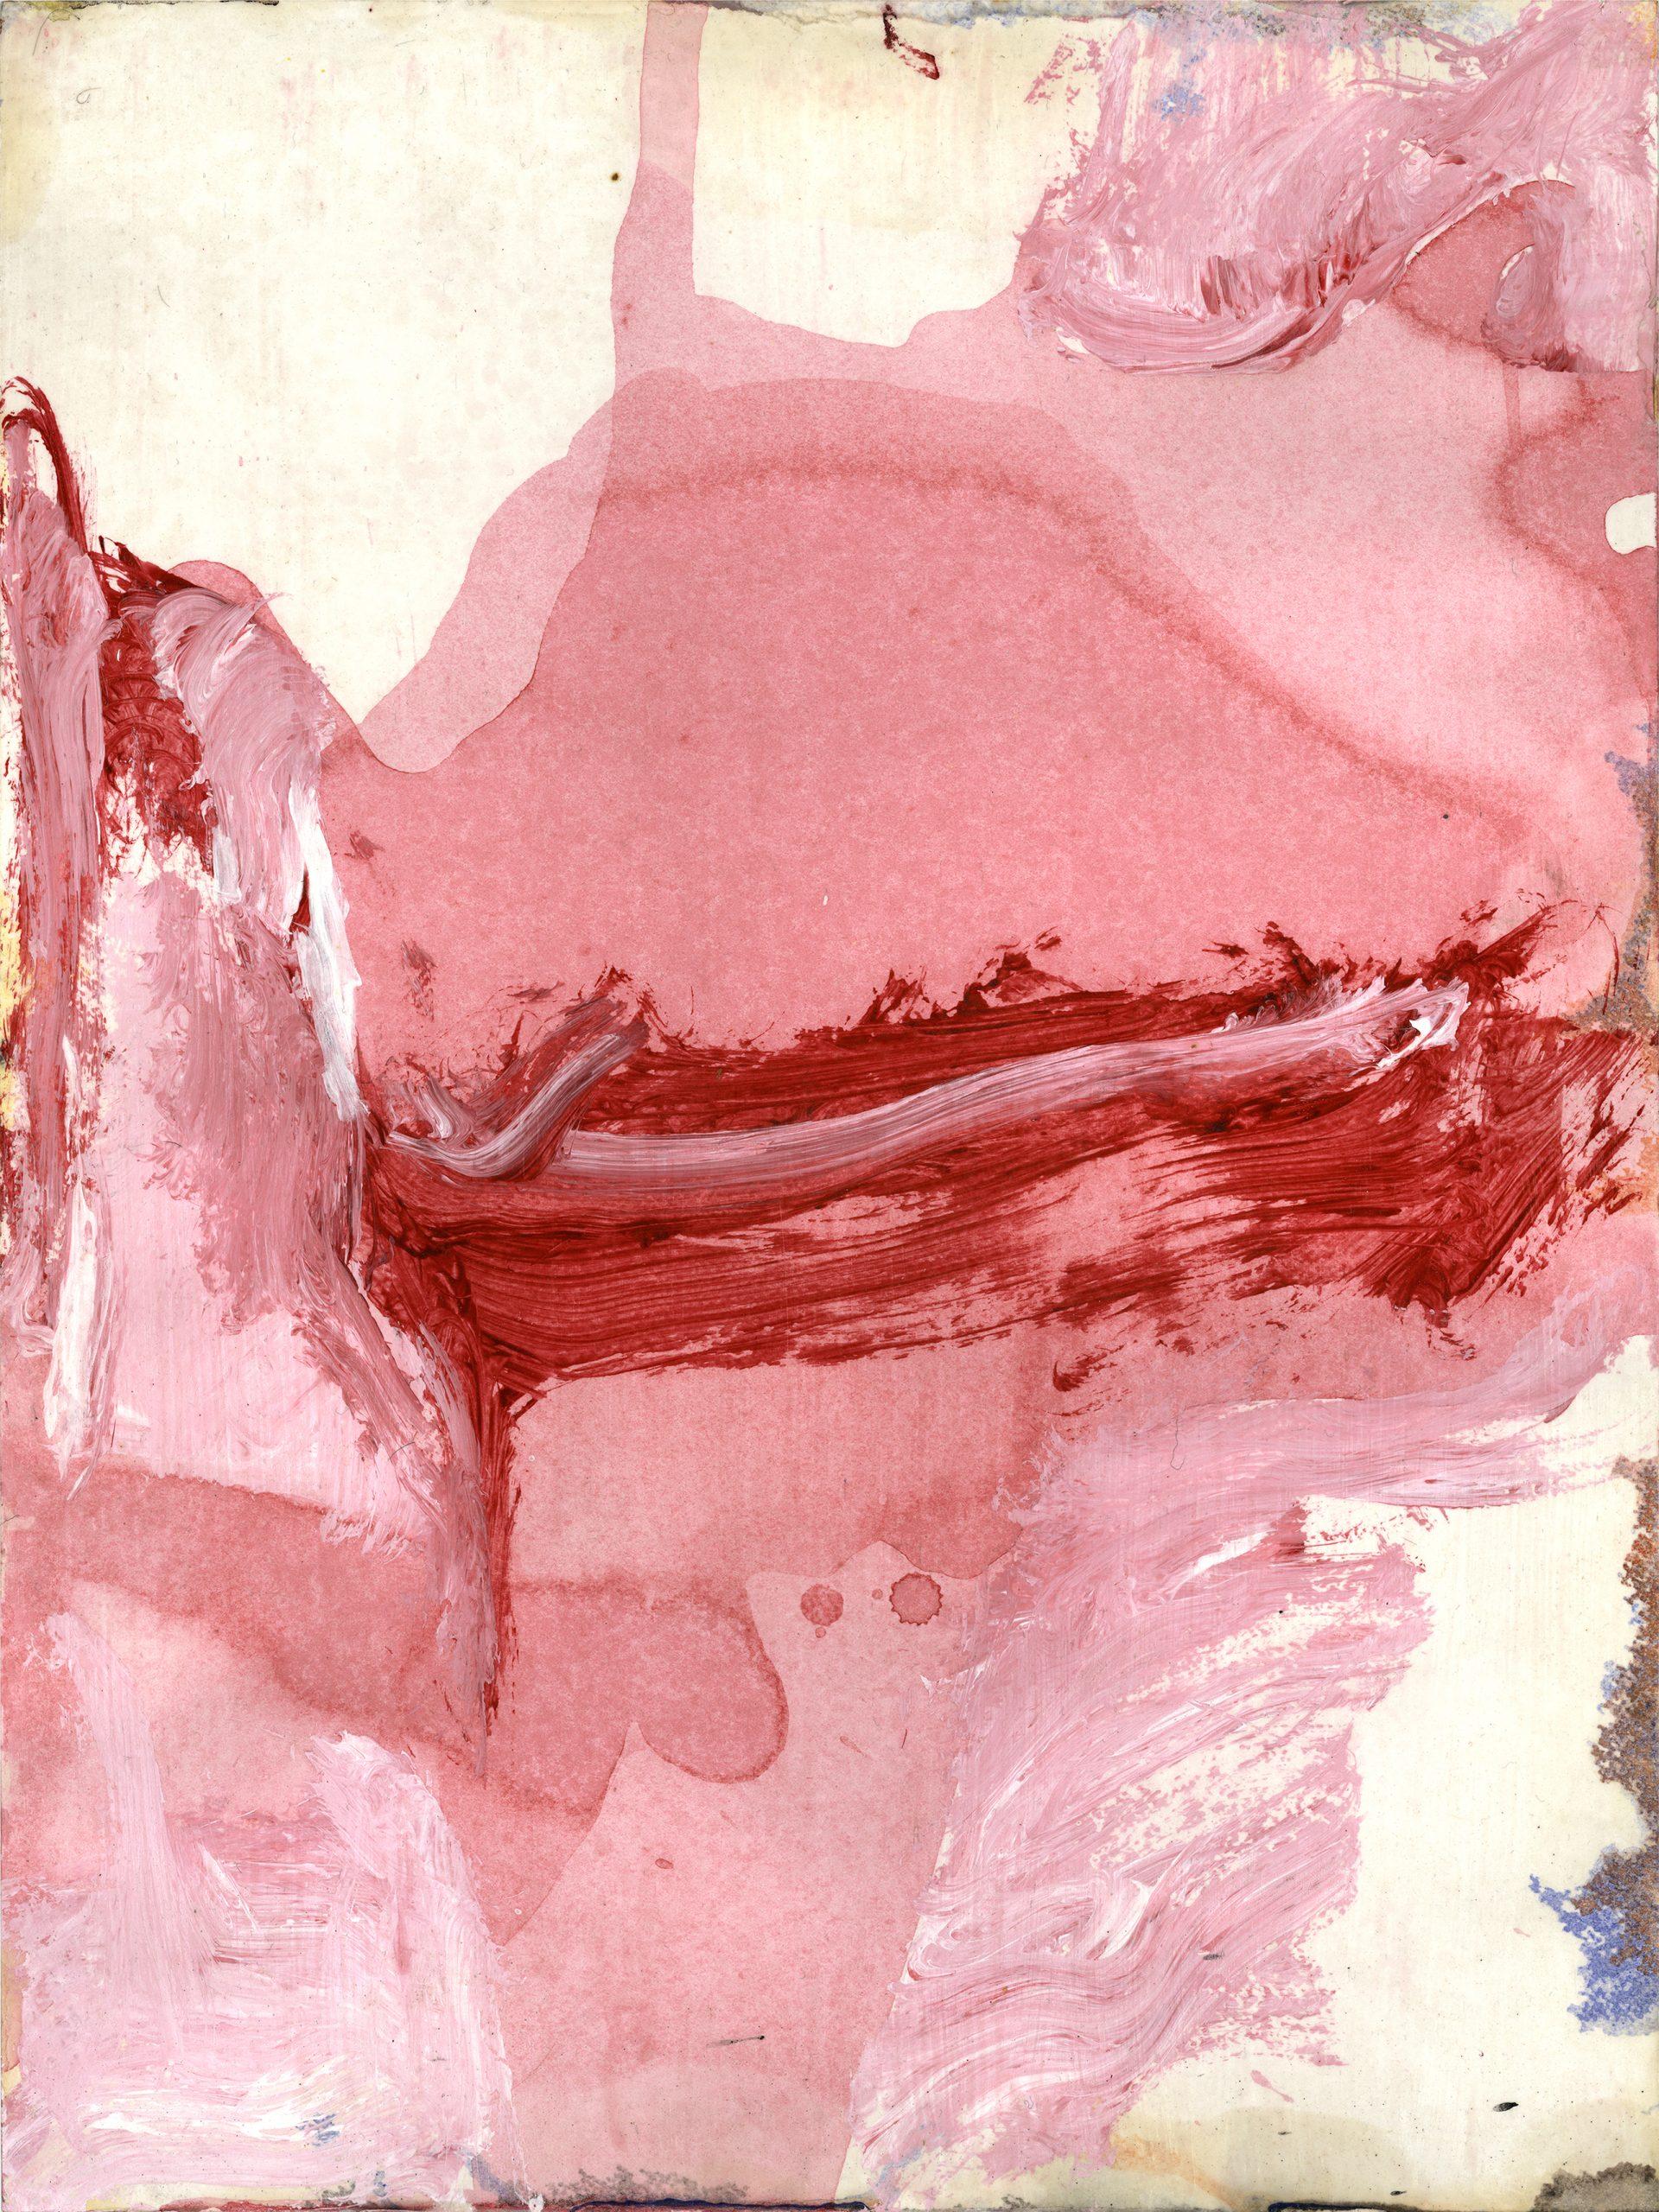 Peregrine n°14, Acrylic on Paper, 61 x 46 cm, 2015